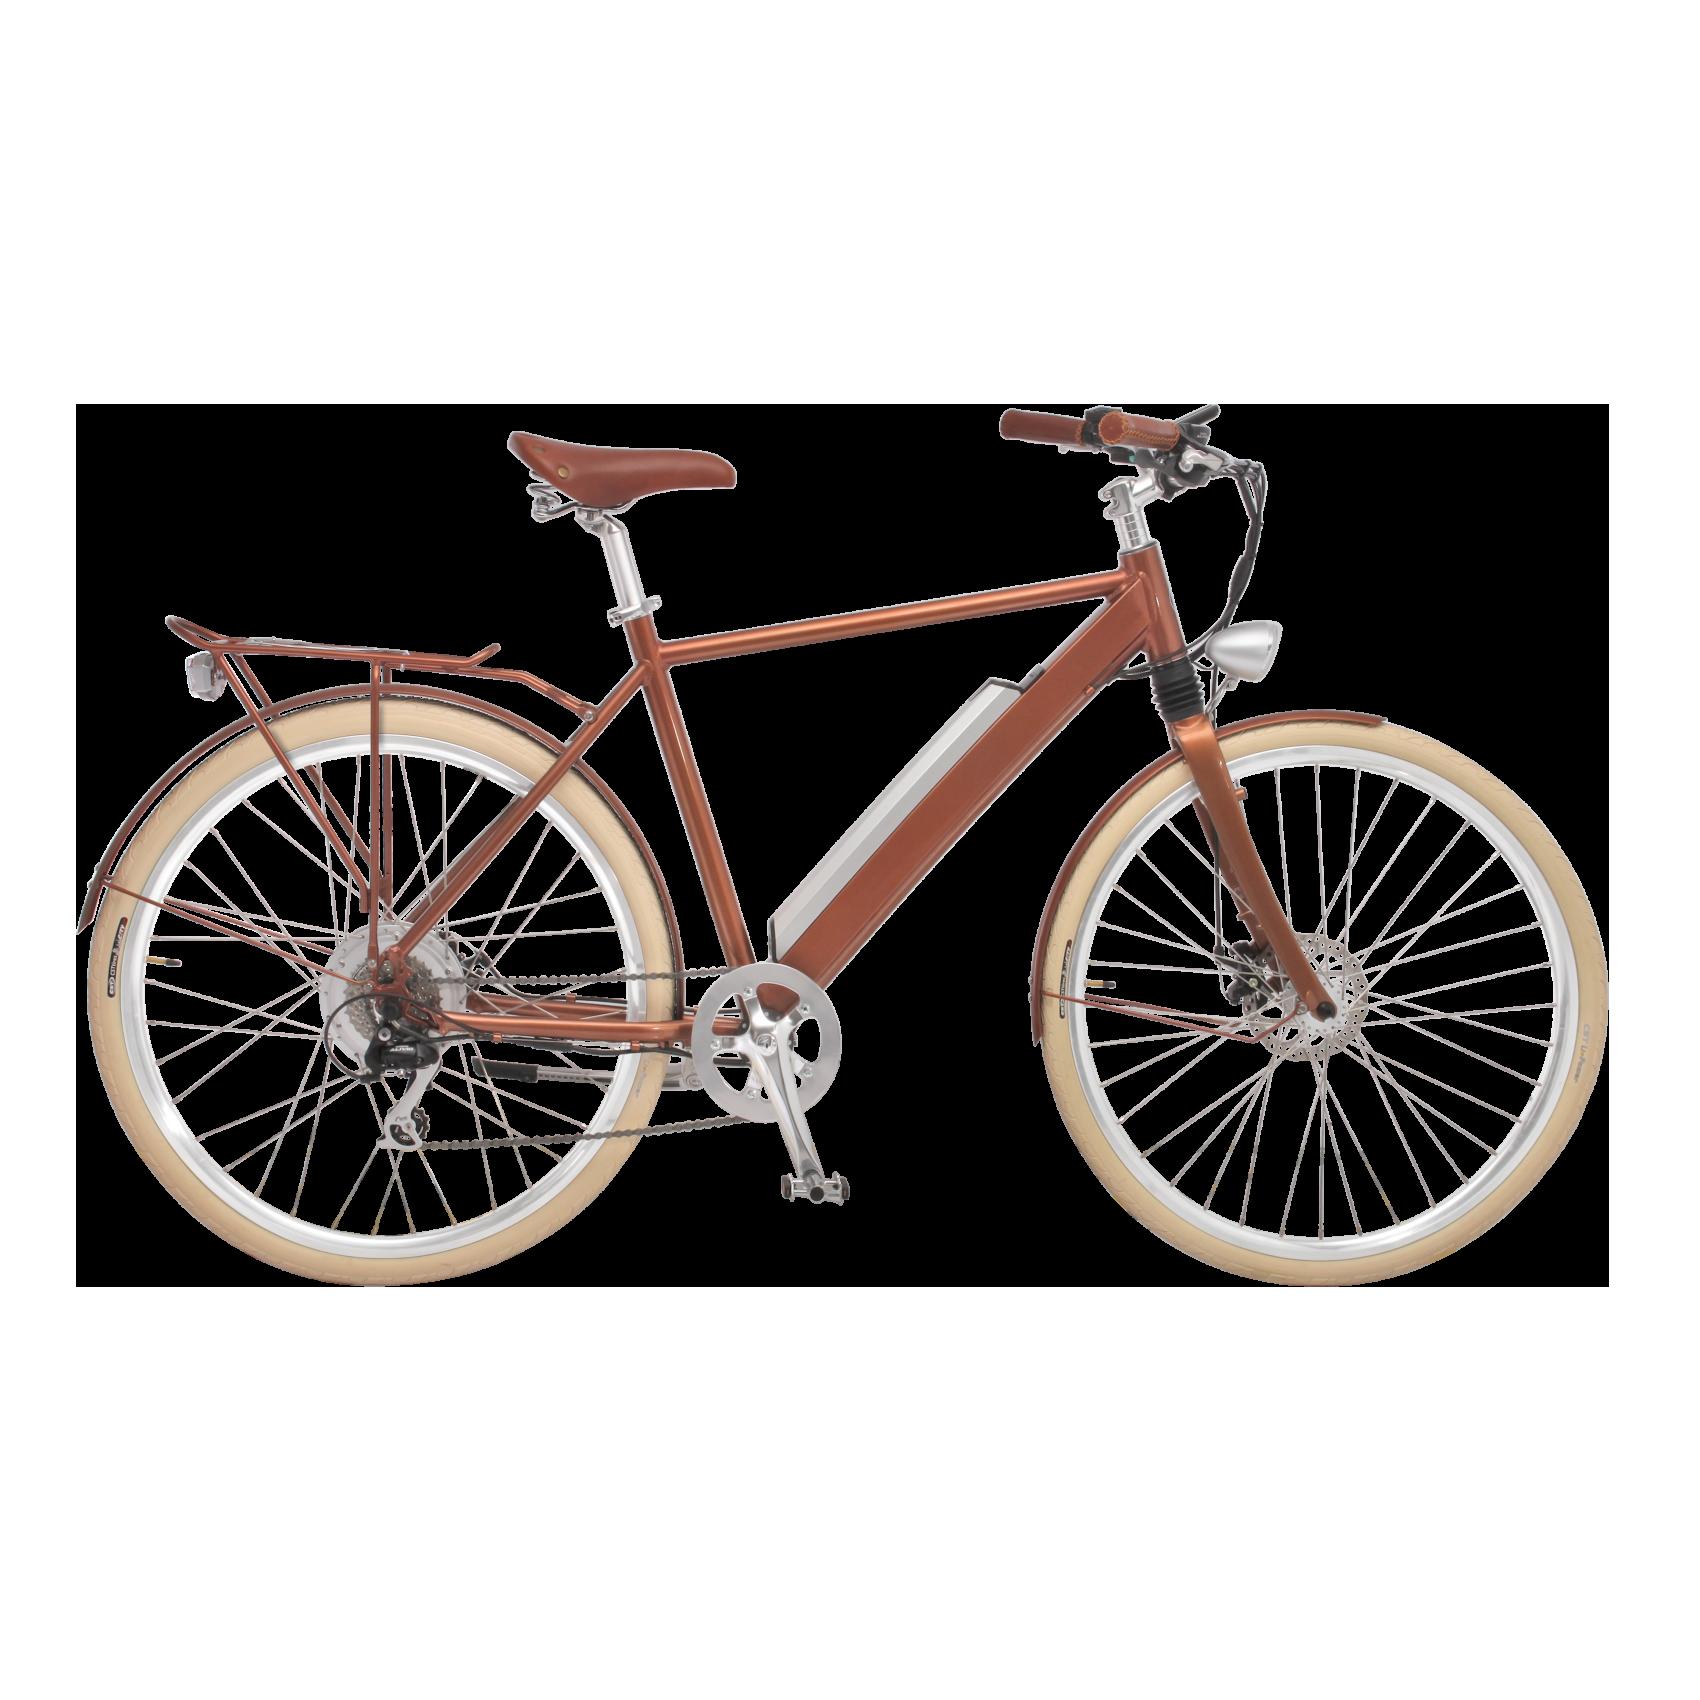 e bike c sar heckmotor 250w mit schutzblech gep cktr ger. Black Bedroom Furniture Sets. Home Design Ideas